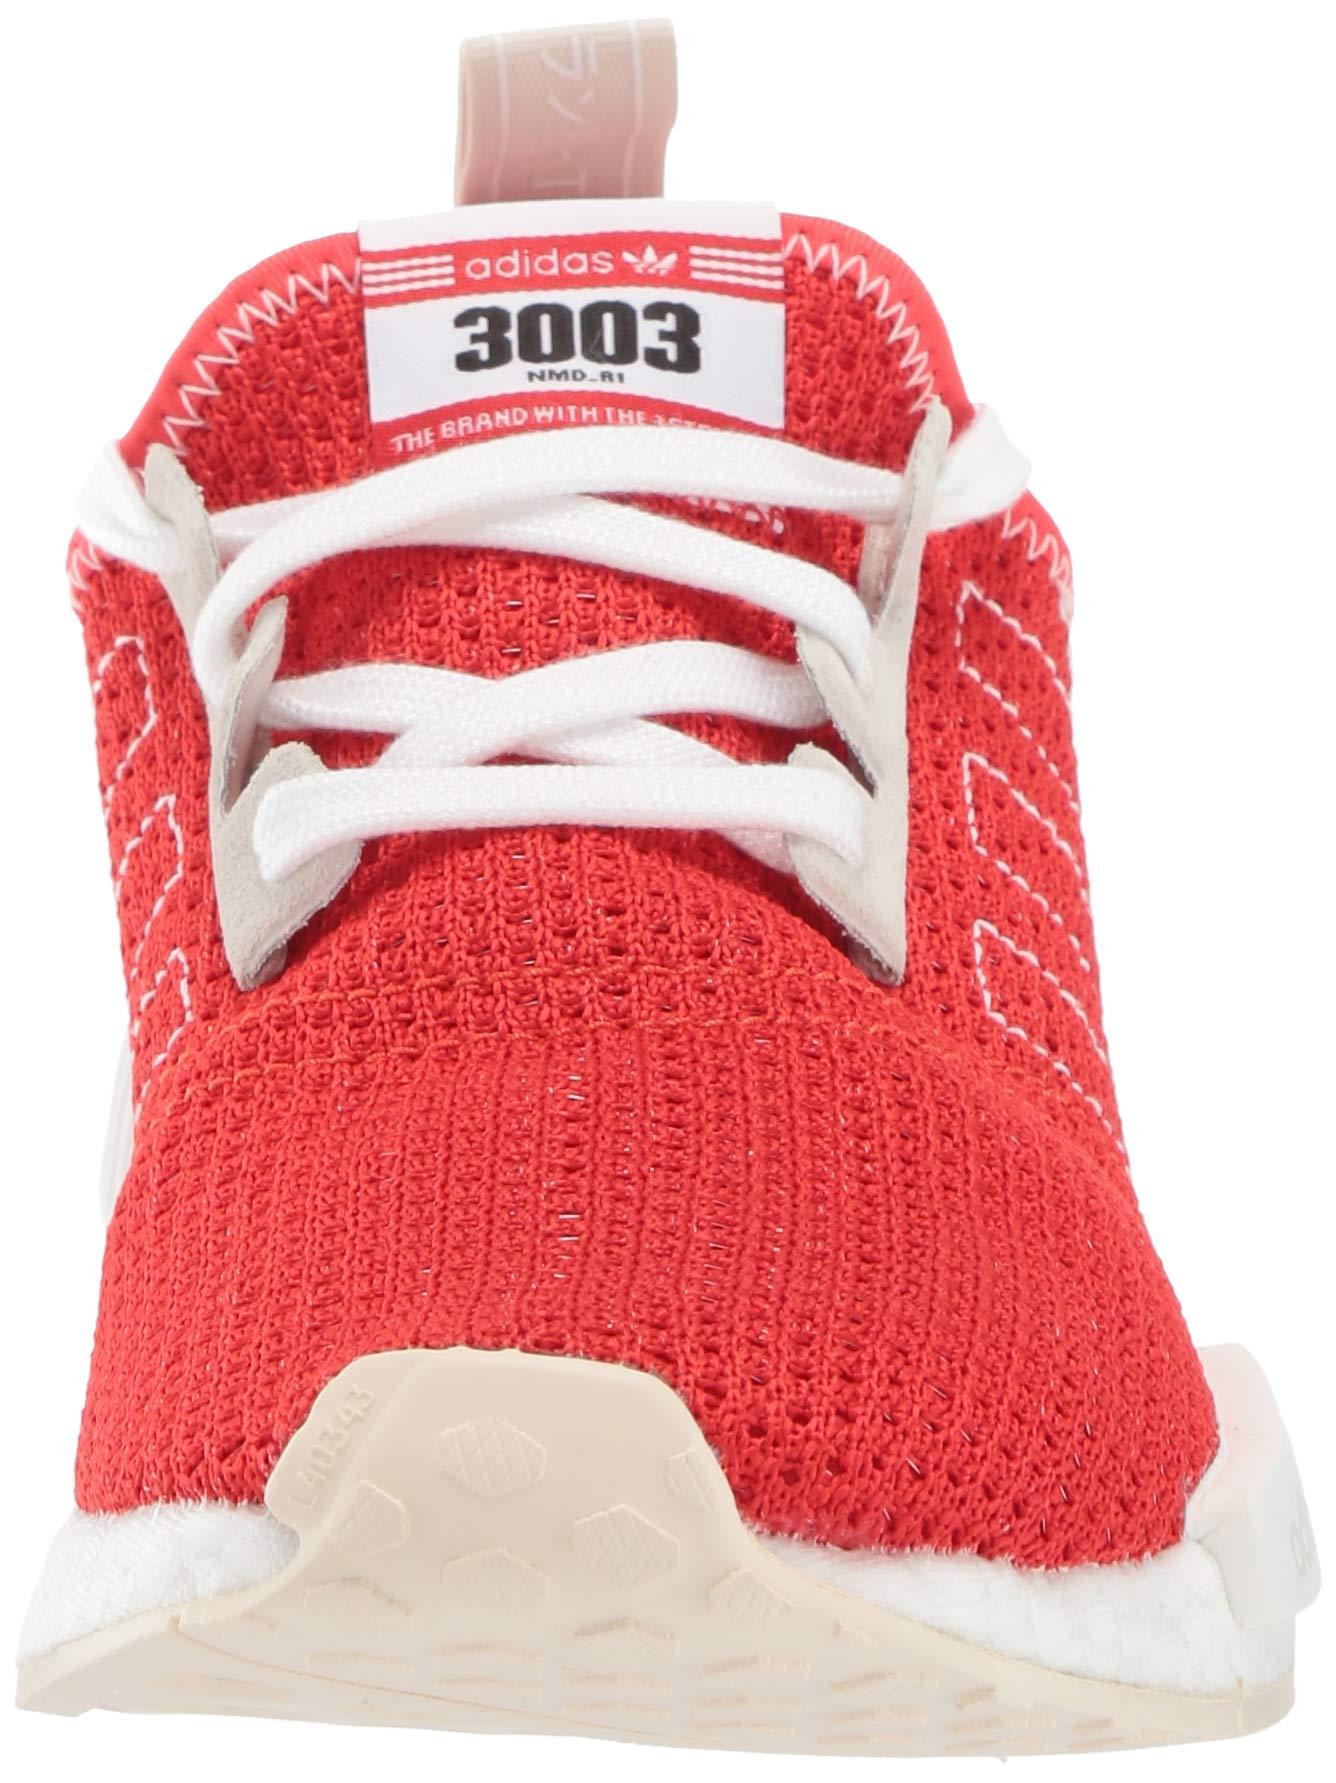 adidas Originals Men's NMD_R1 Running Shoe, Active red/Ecru Tint, 4 M US by adidas Originals (Image #4)